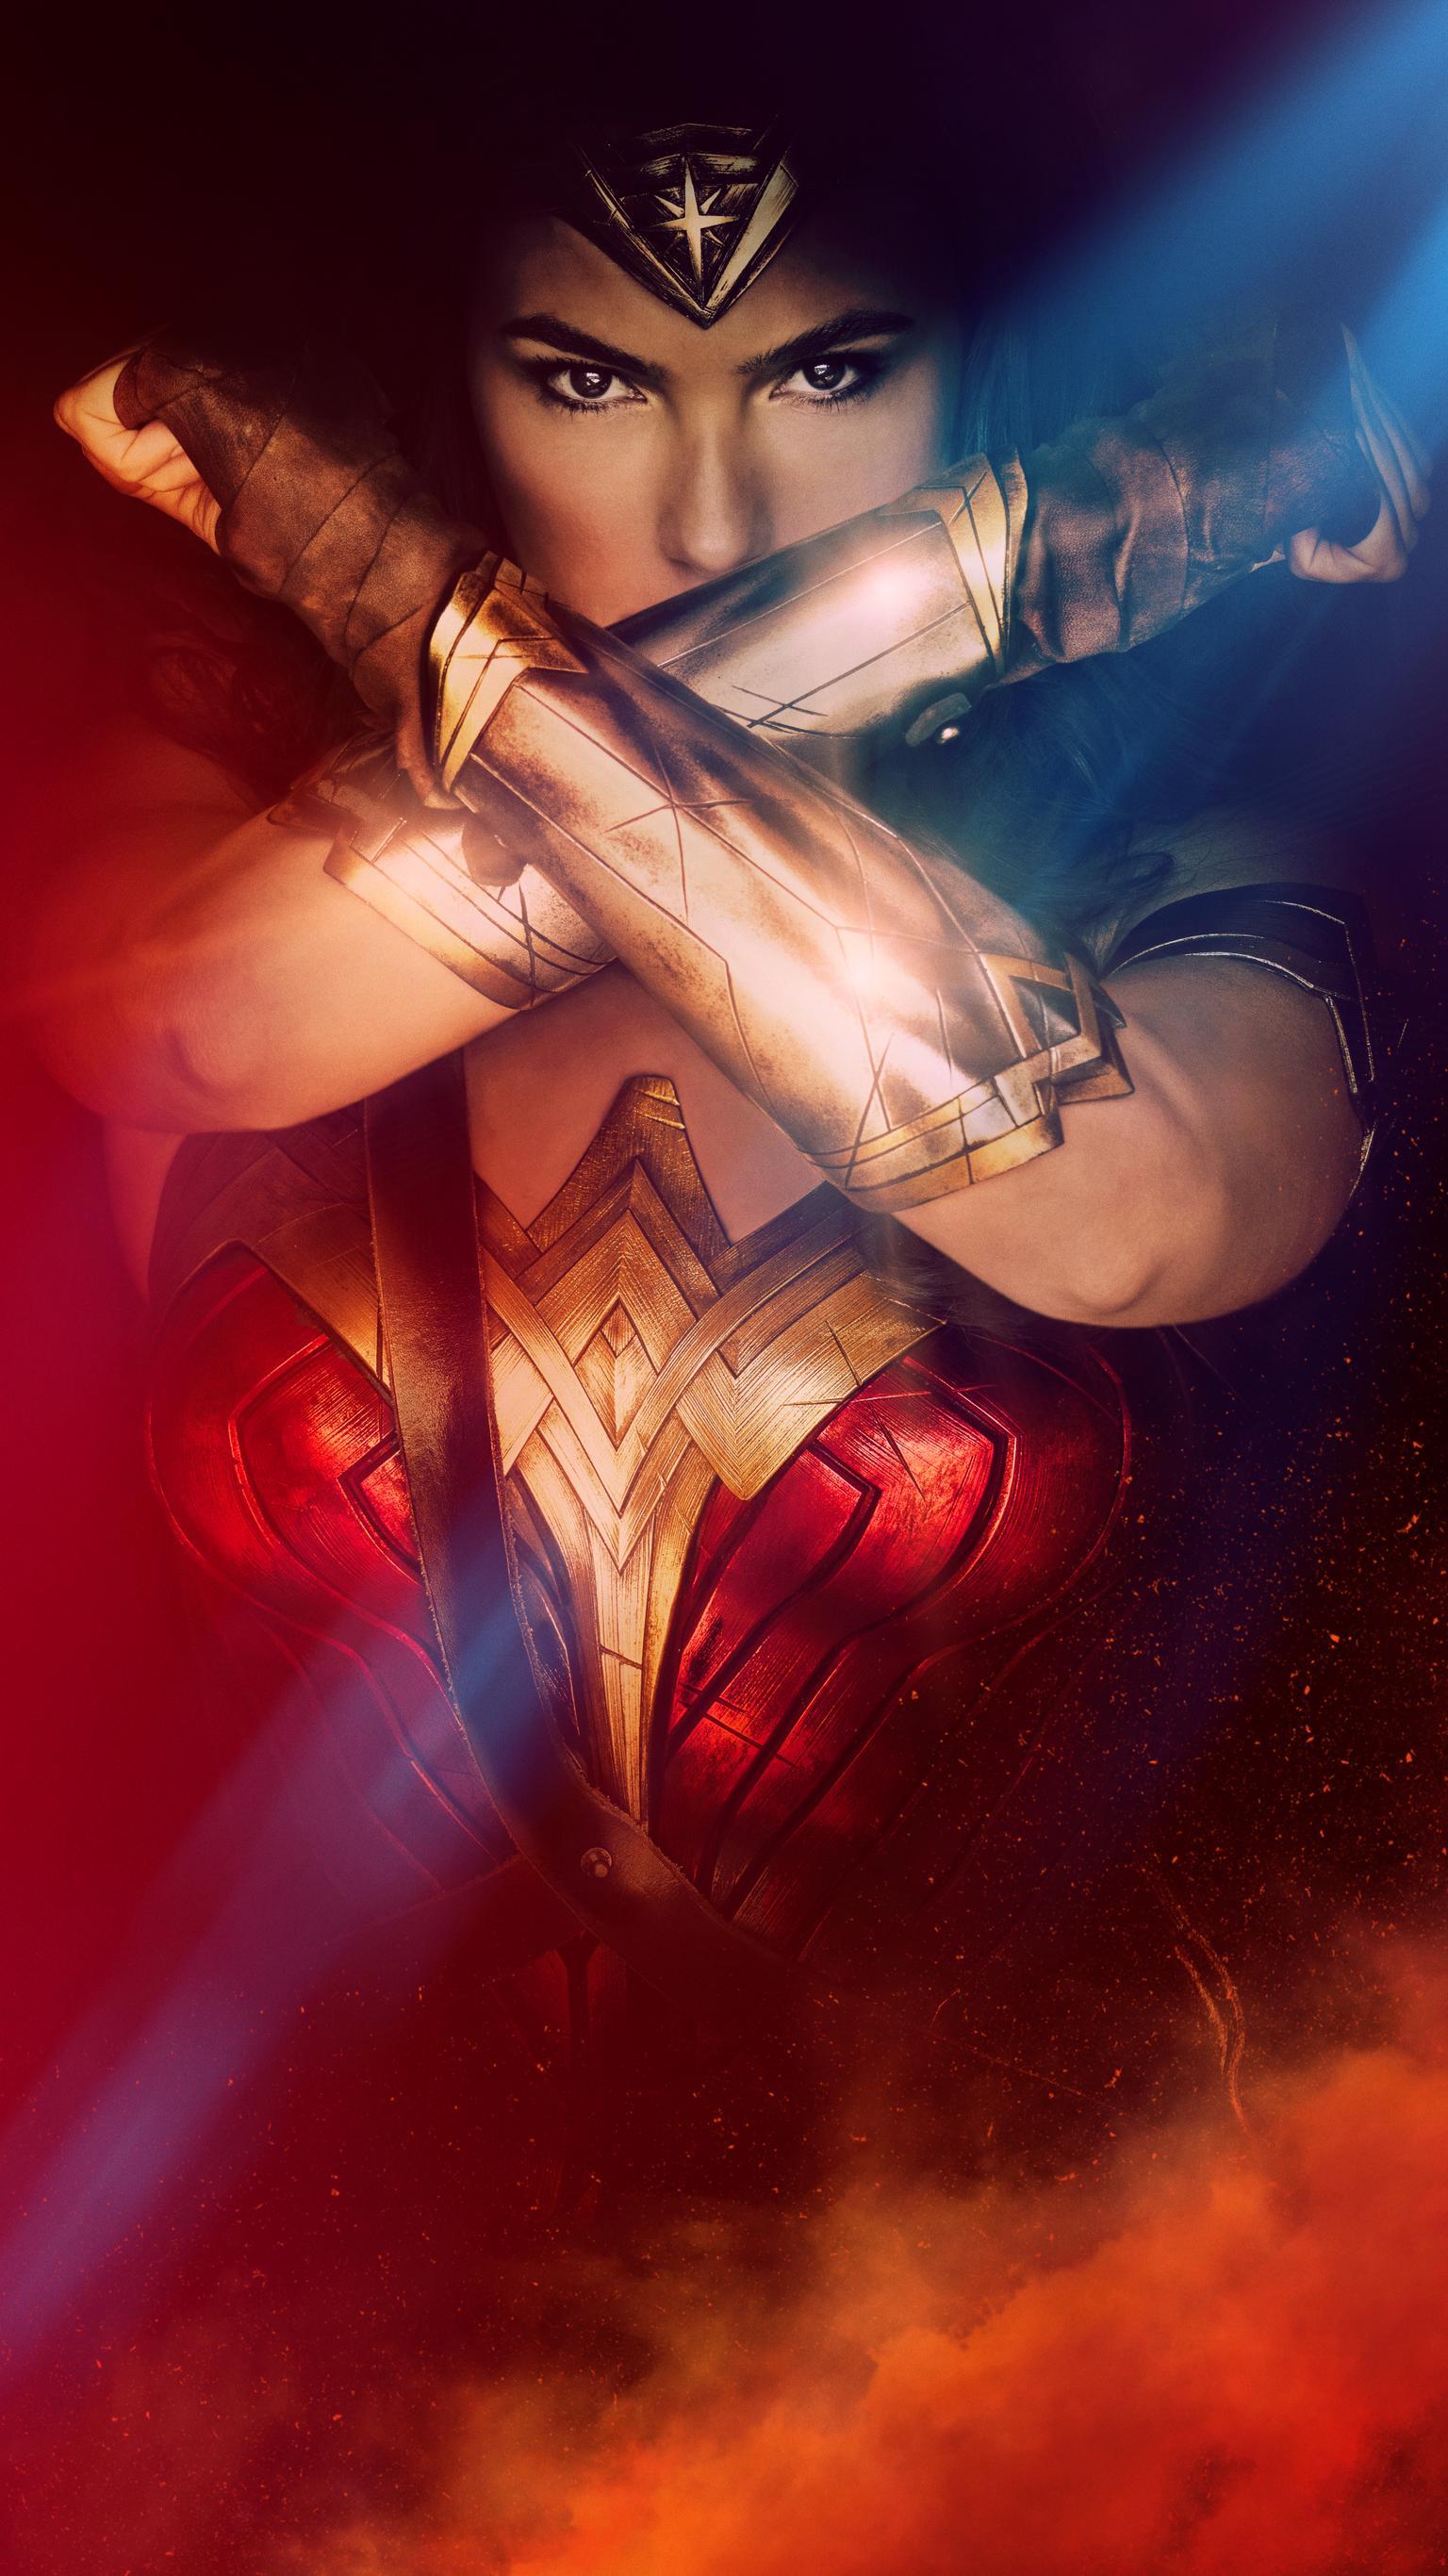 Wonder Woman 2017 Phone Wallpaper Moviemania 1536x2732